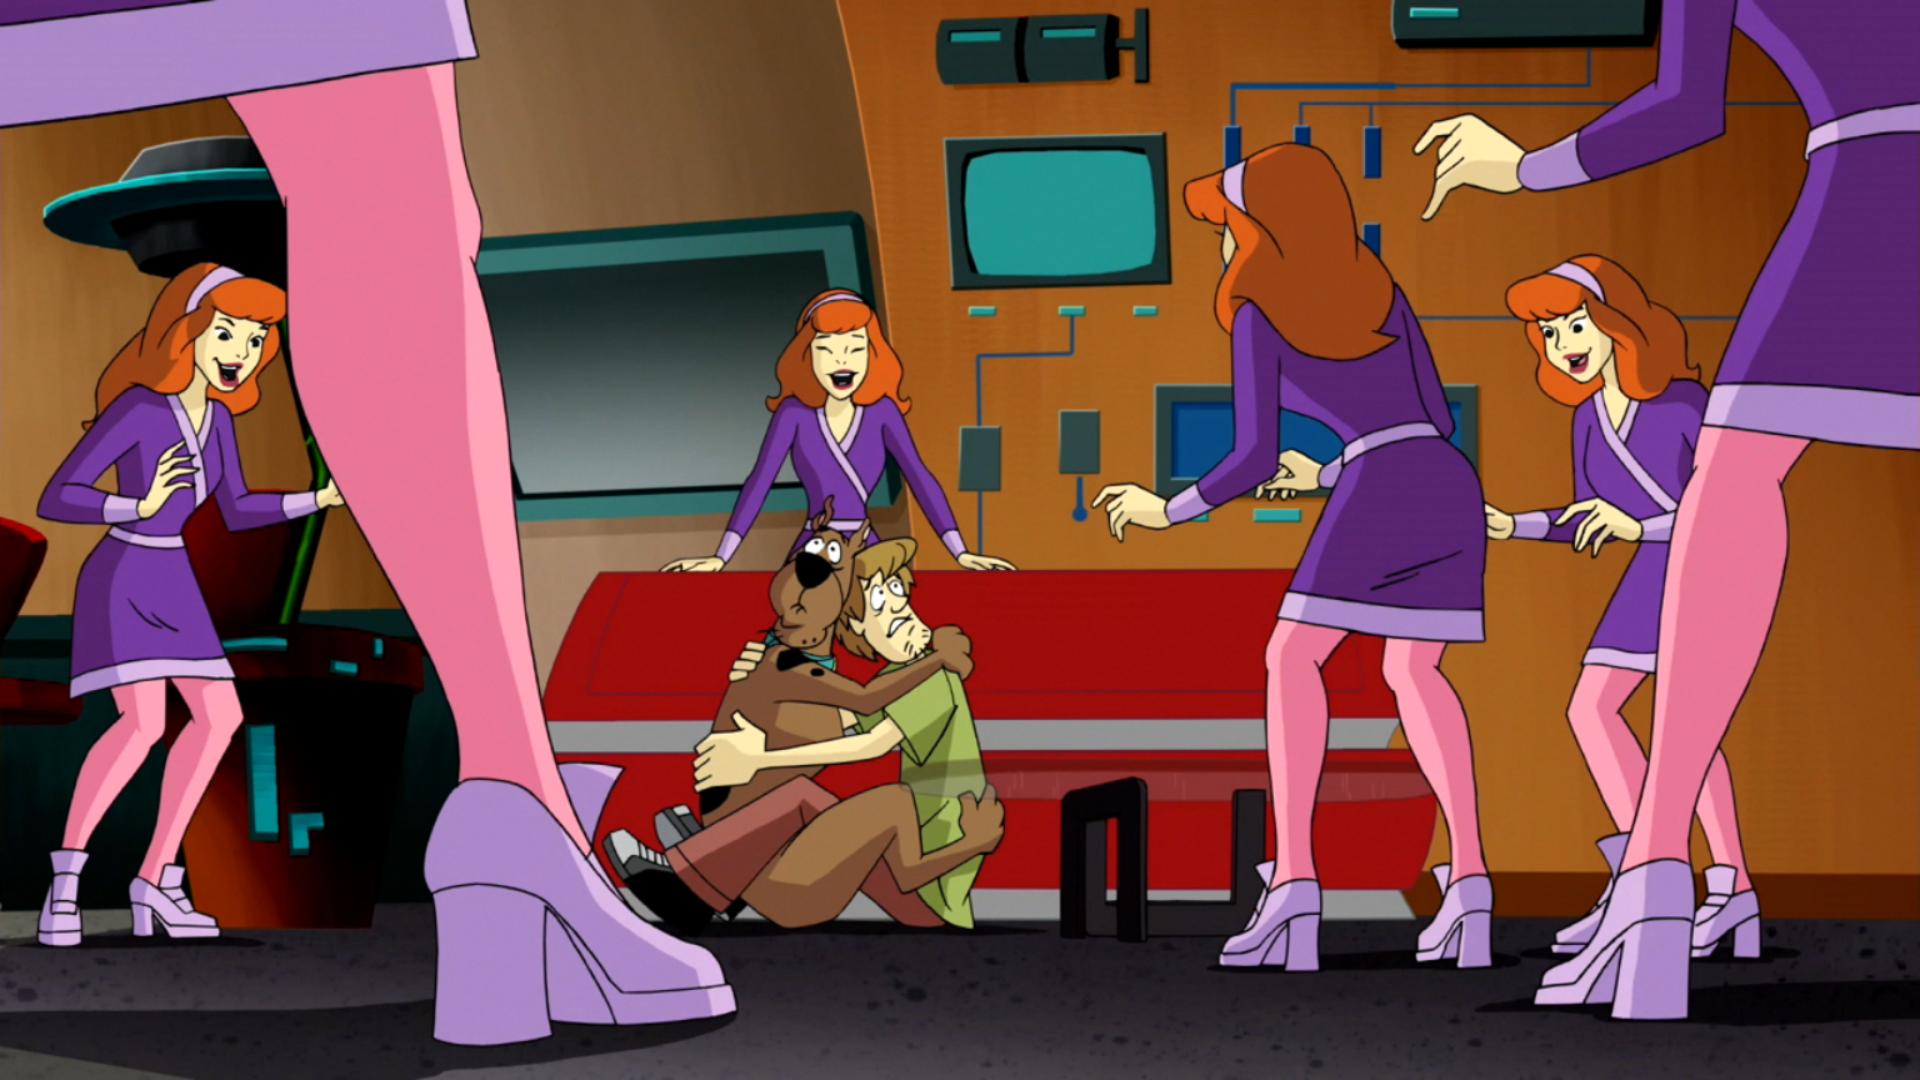 Beautiful Wallpaper Halloween Scooby Doo - latest?cb\u003d20151117195552  HD_59937.png/revision/latest?cb\u003d20151117195552